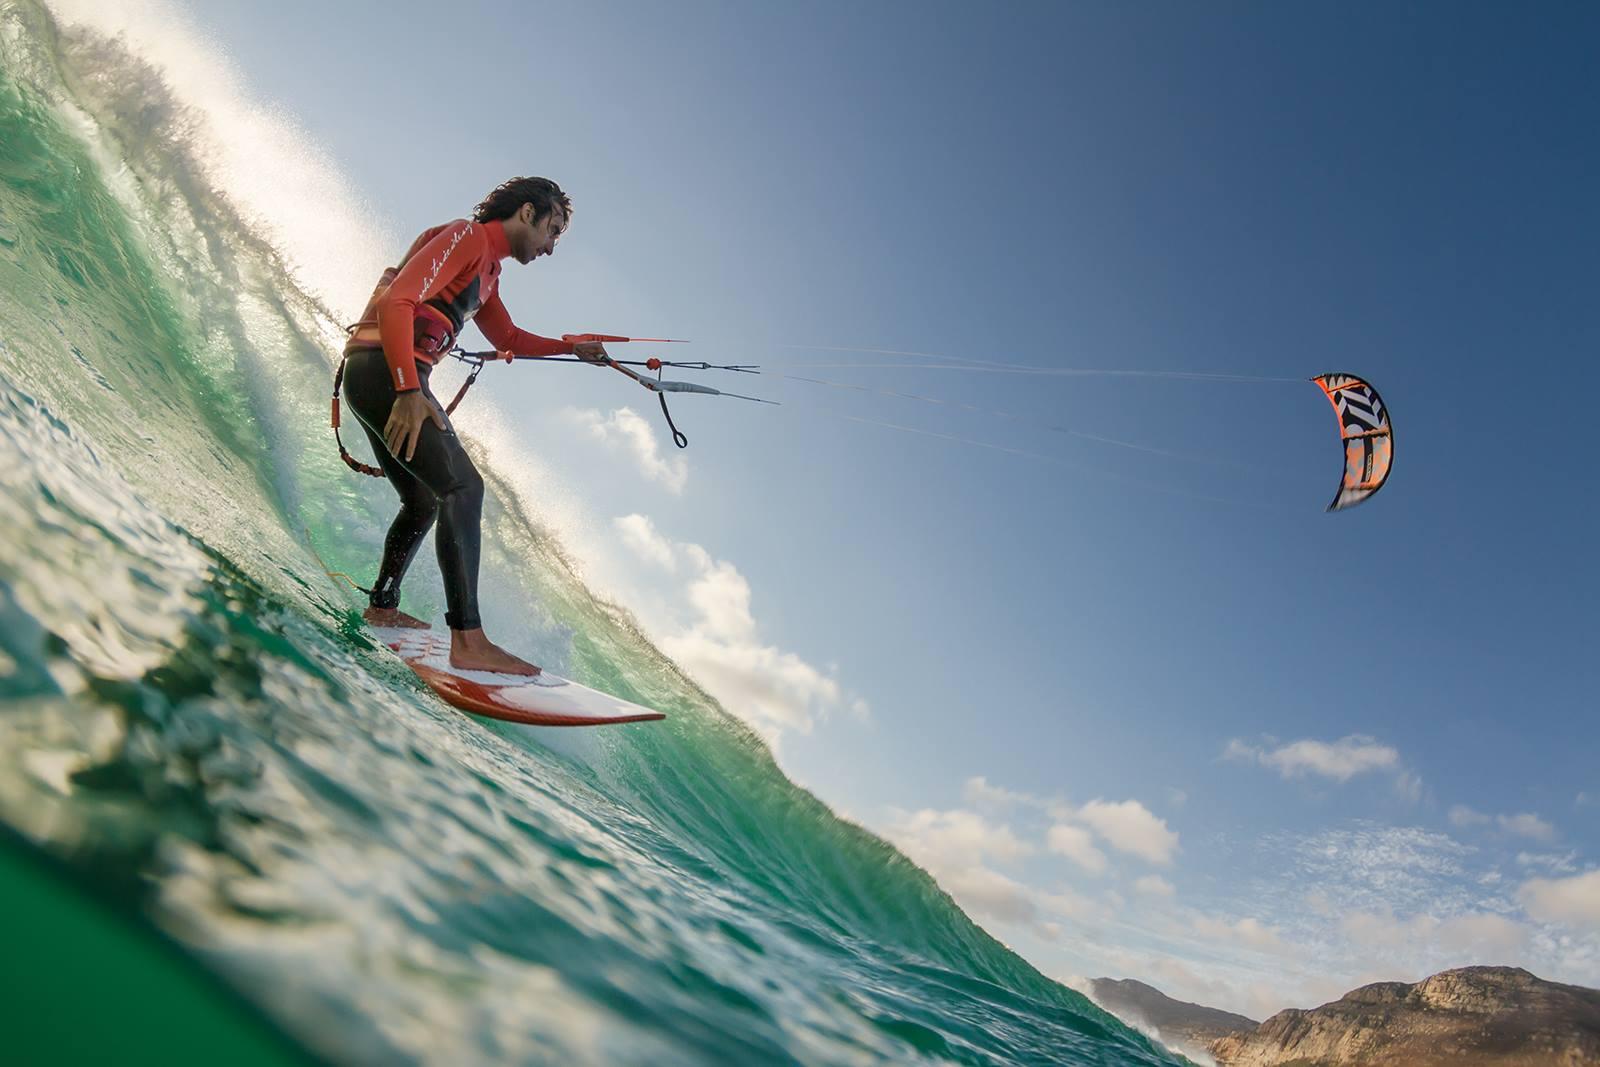 10 percent off Portugal kitesurfing holiday in Costa de Caparica image courtesy of Meira Pro Centre